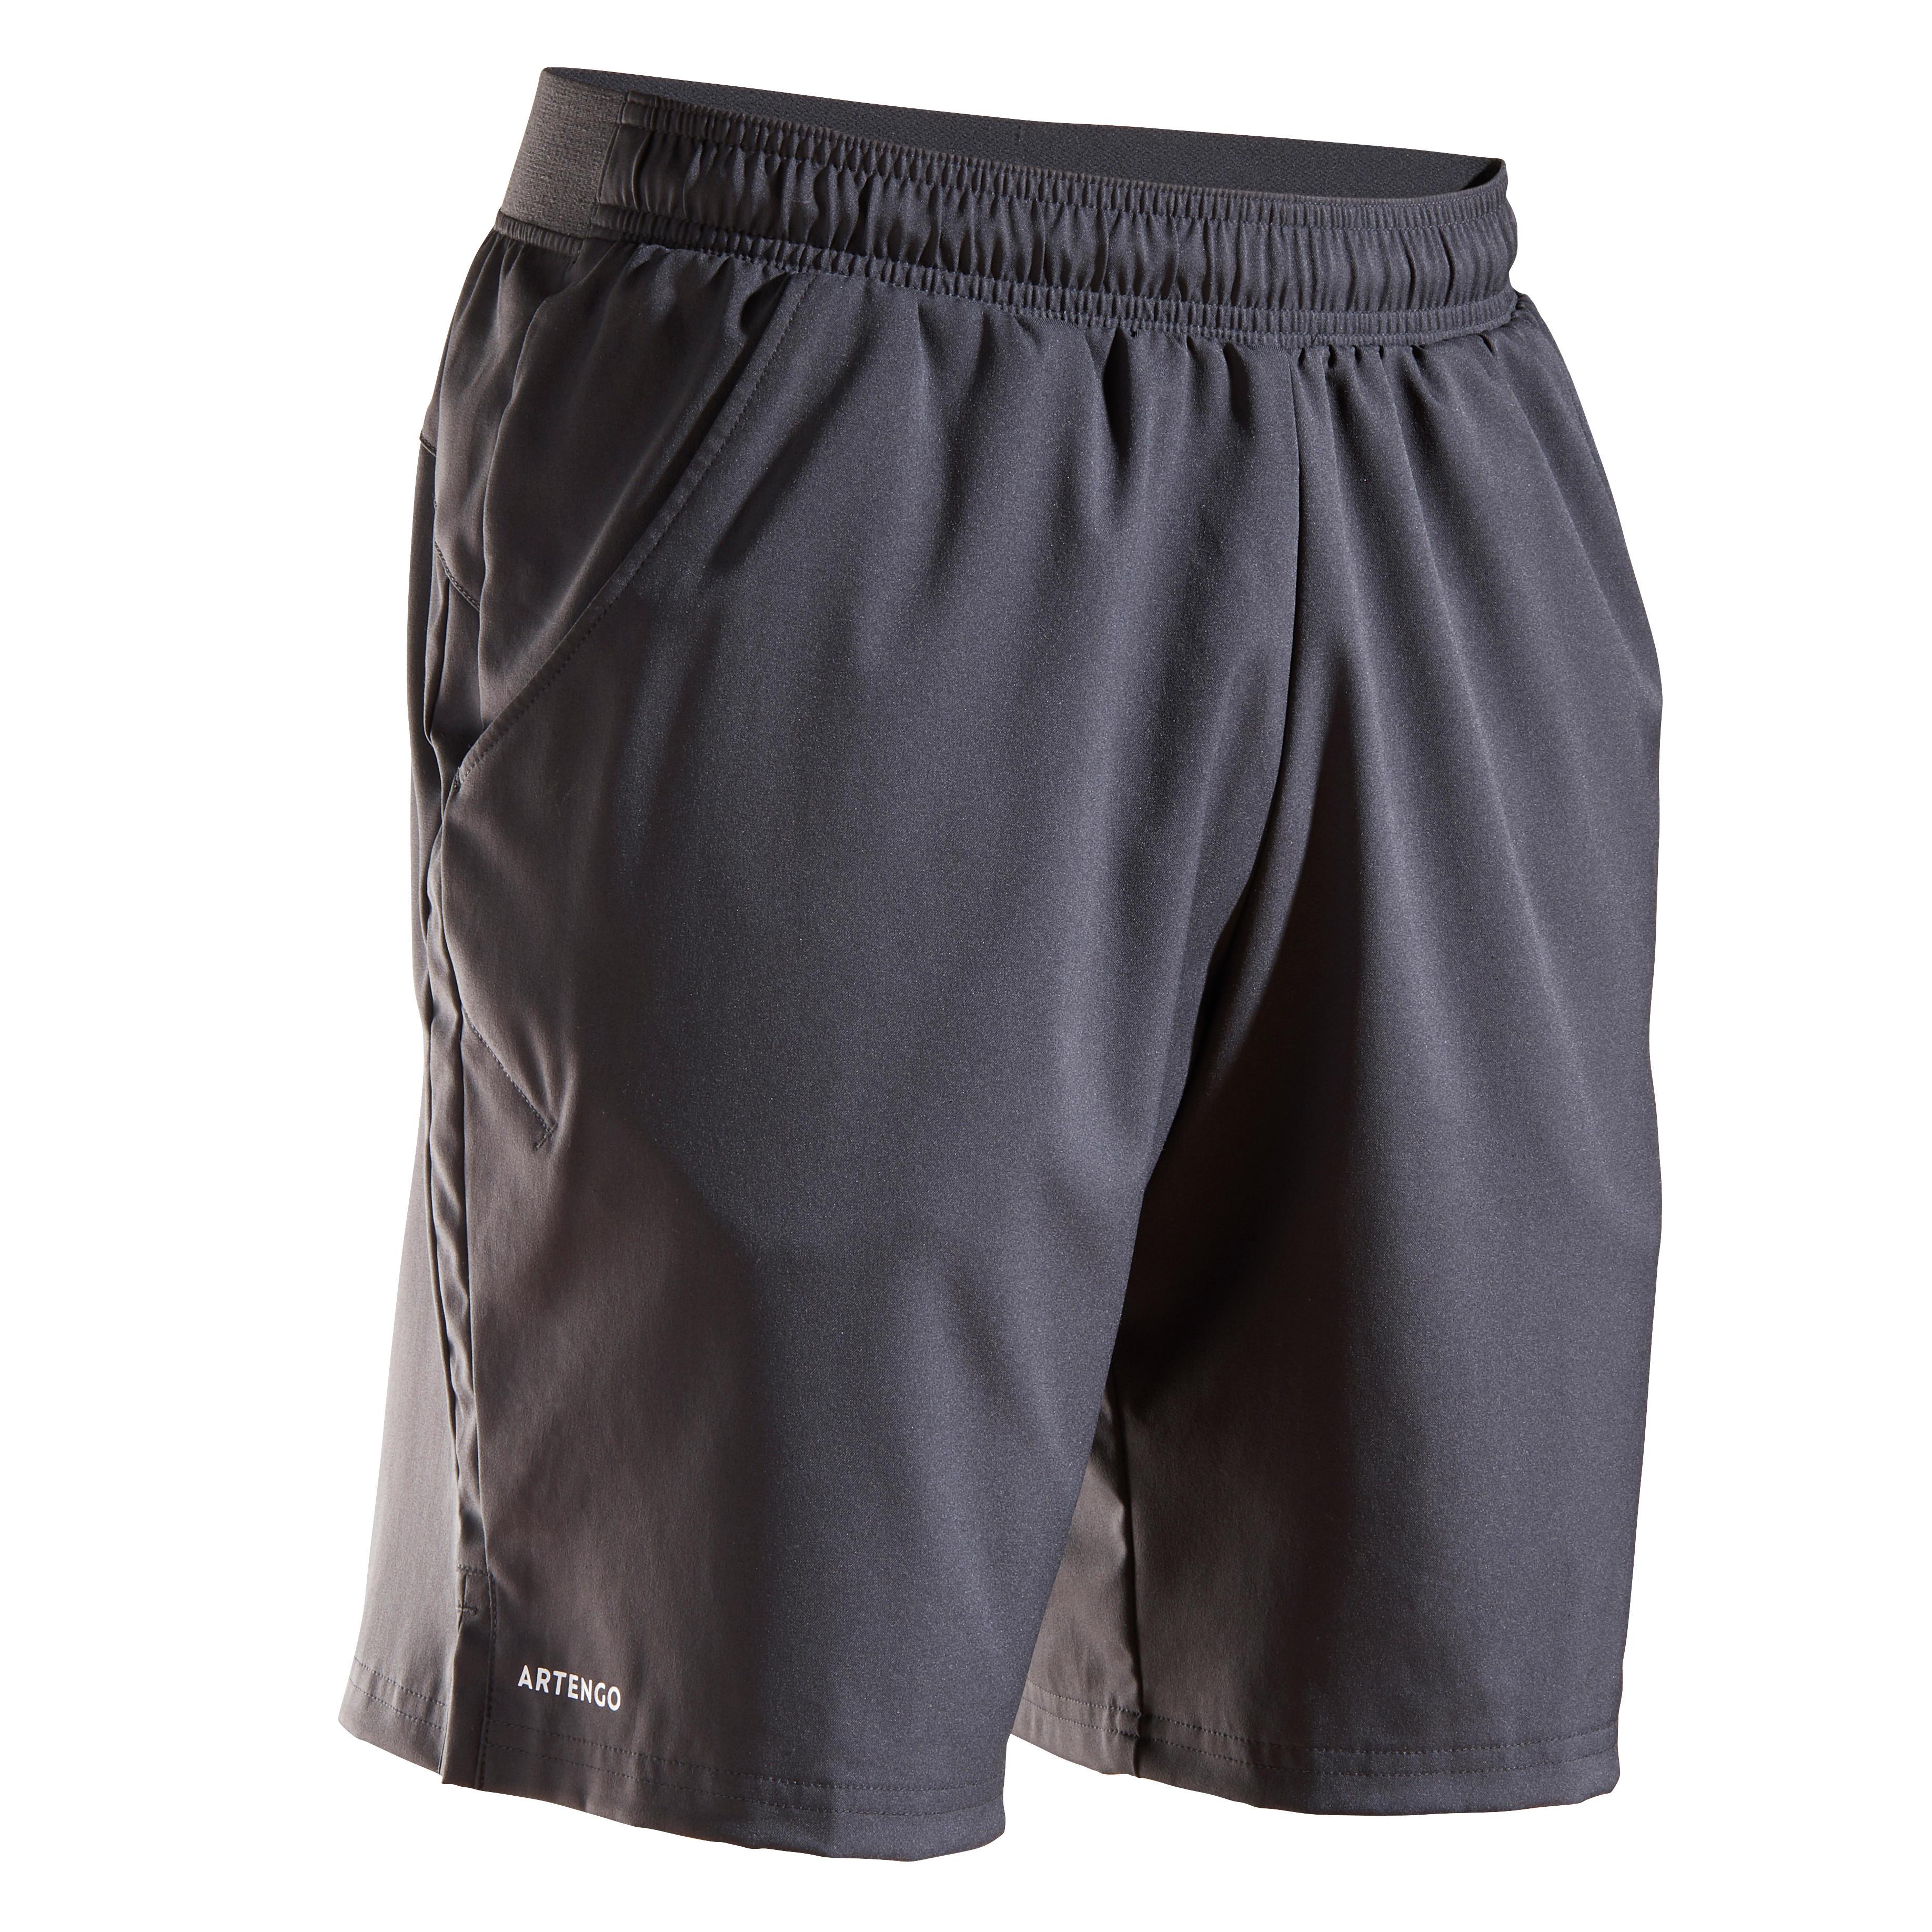 Tennis-Shorts Dry 500 Herren | Sportbekleidung > Sporthosen > Tennisshorts | Artengo